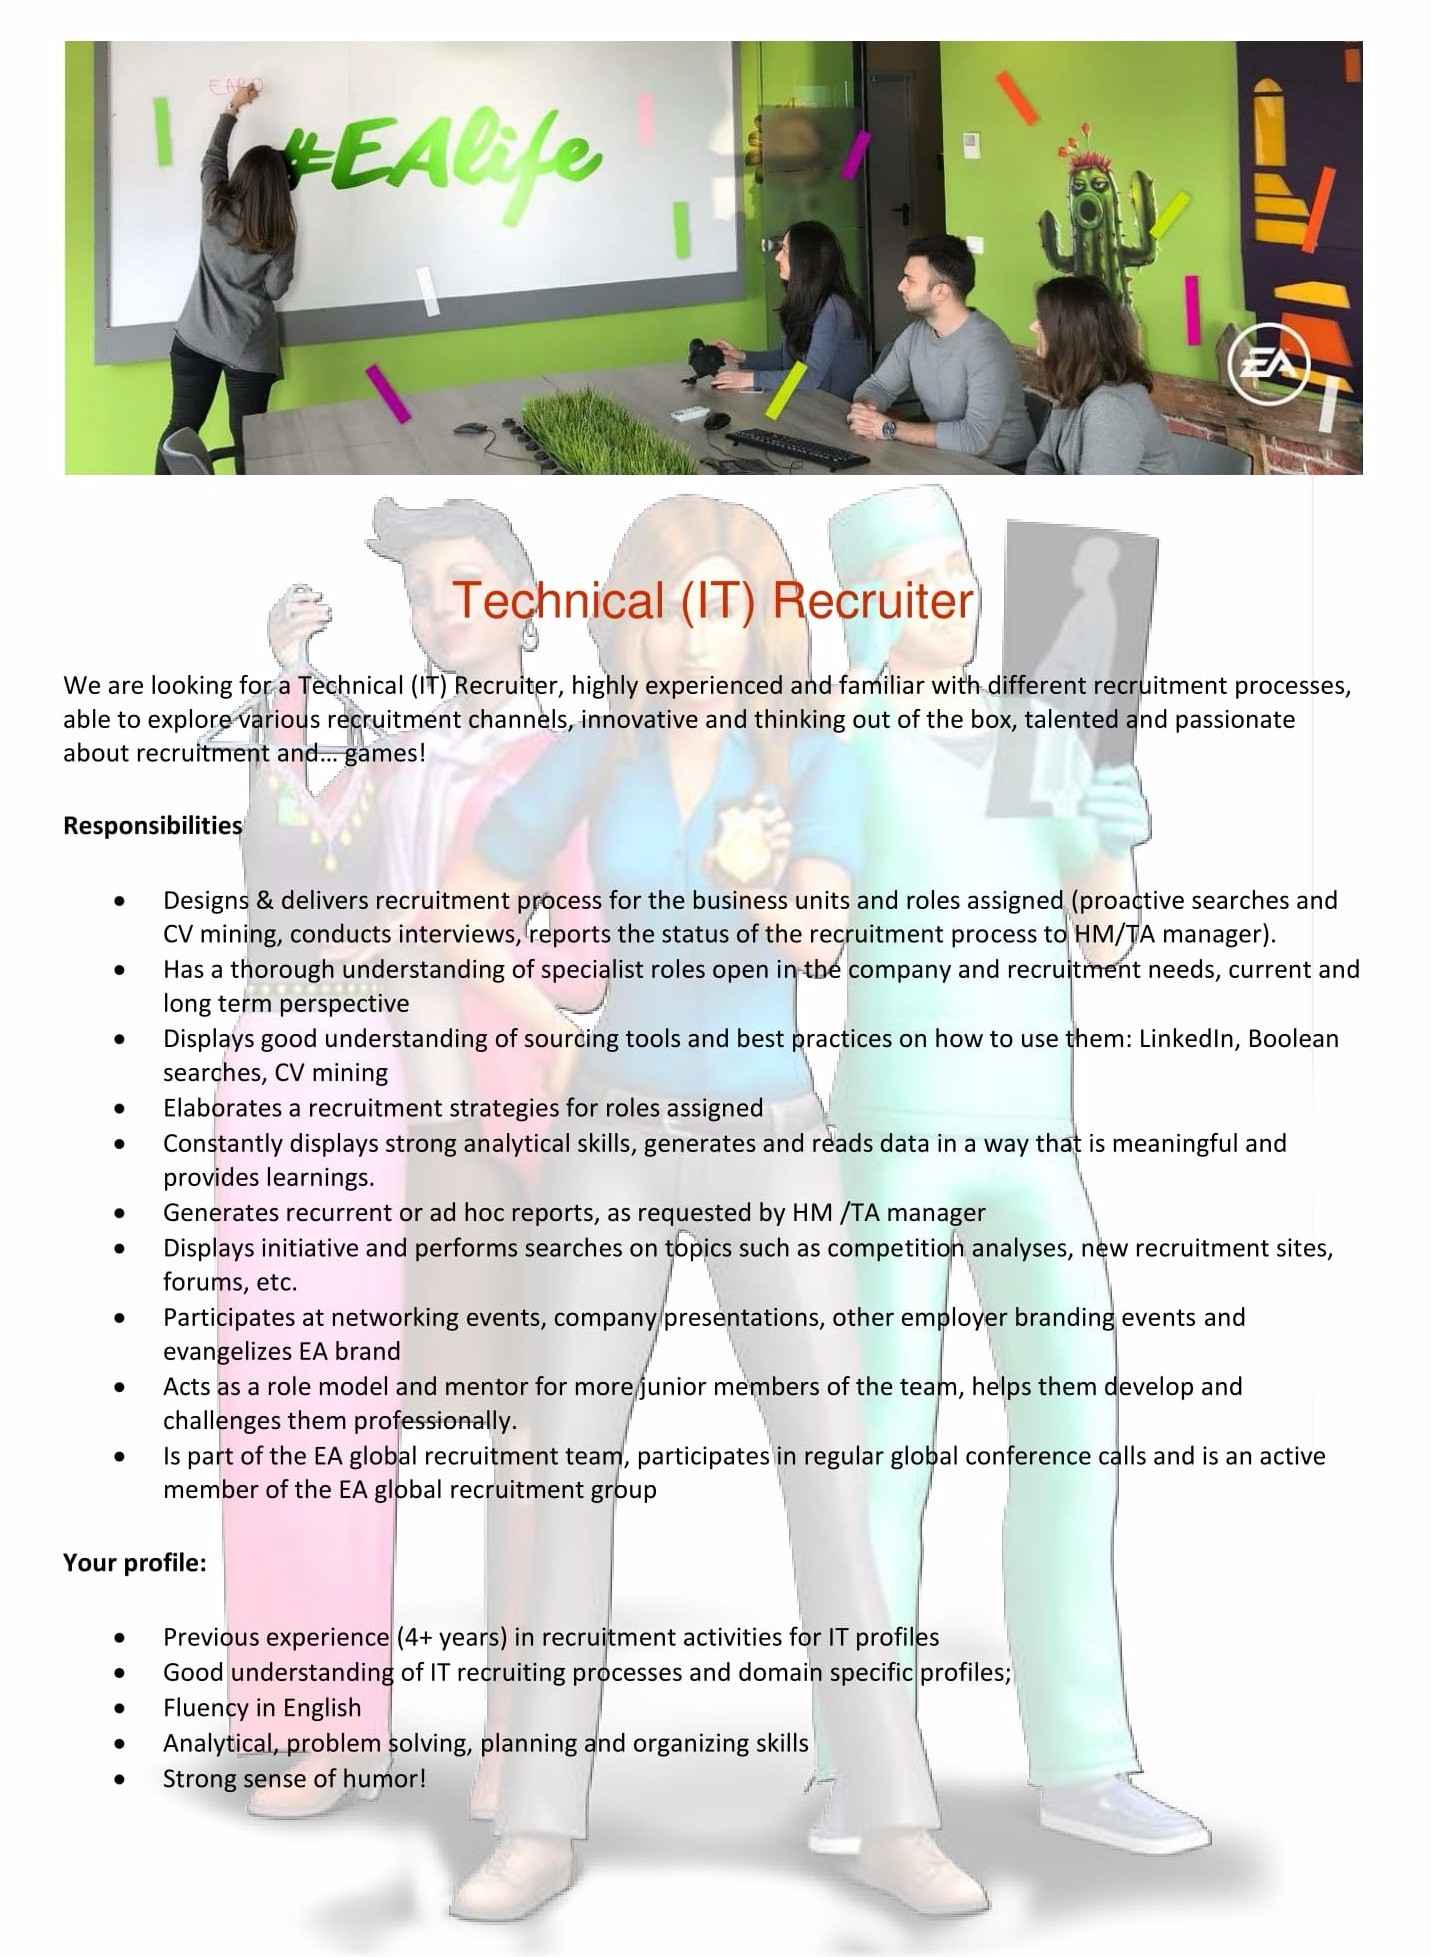 Technical IT Recruiter-1